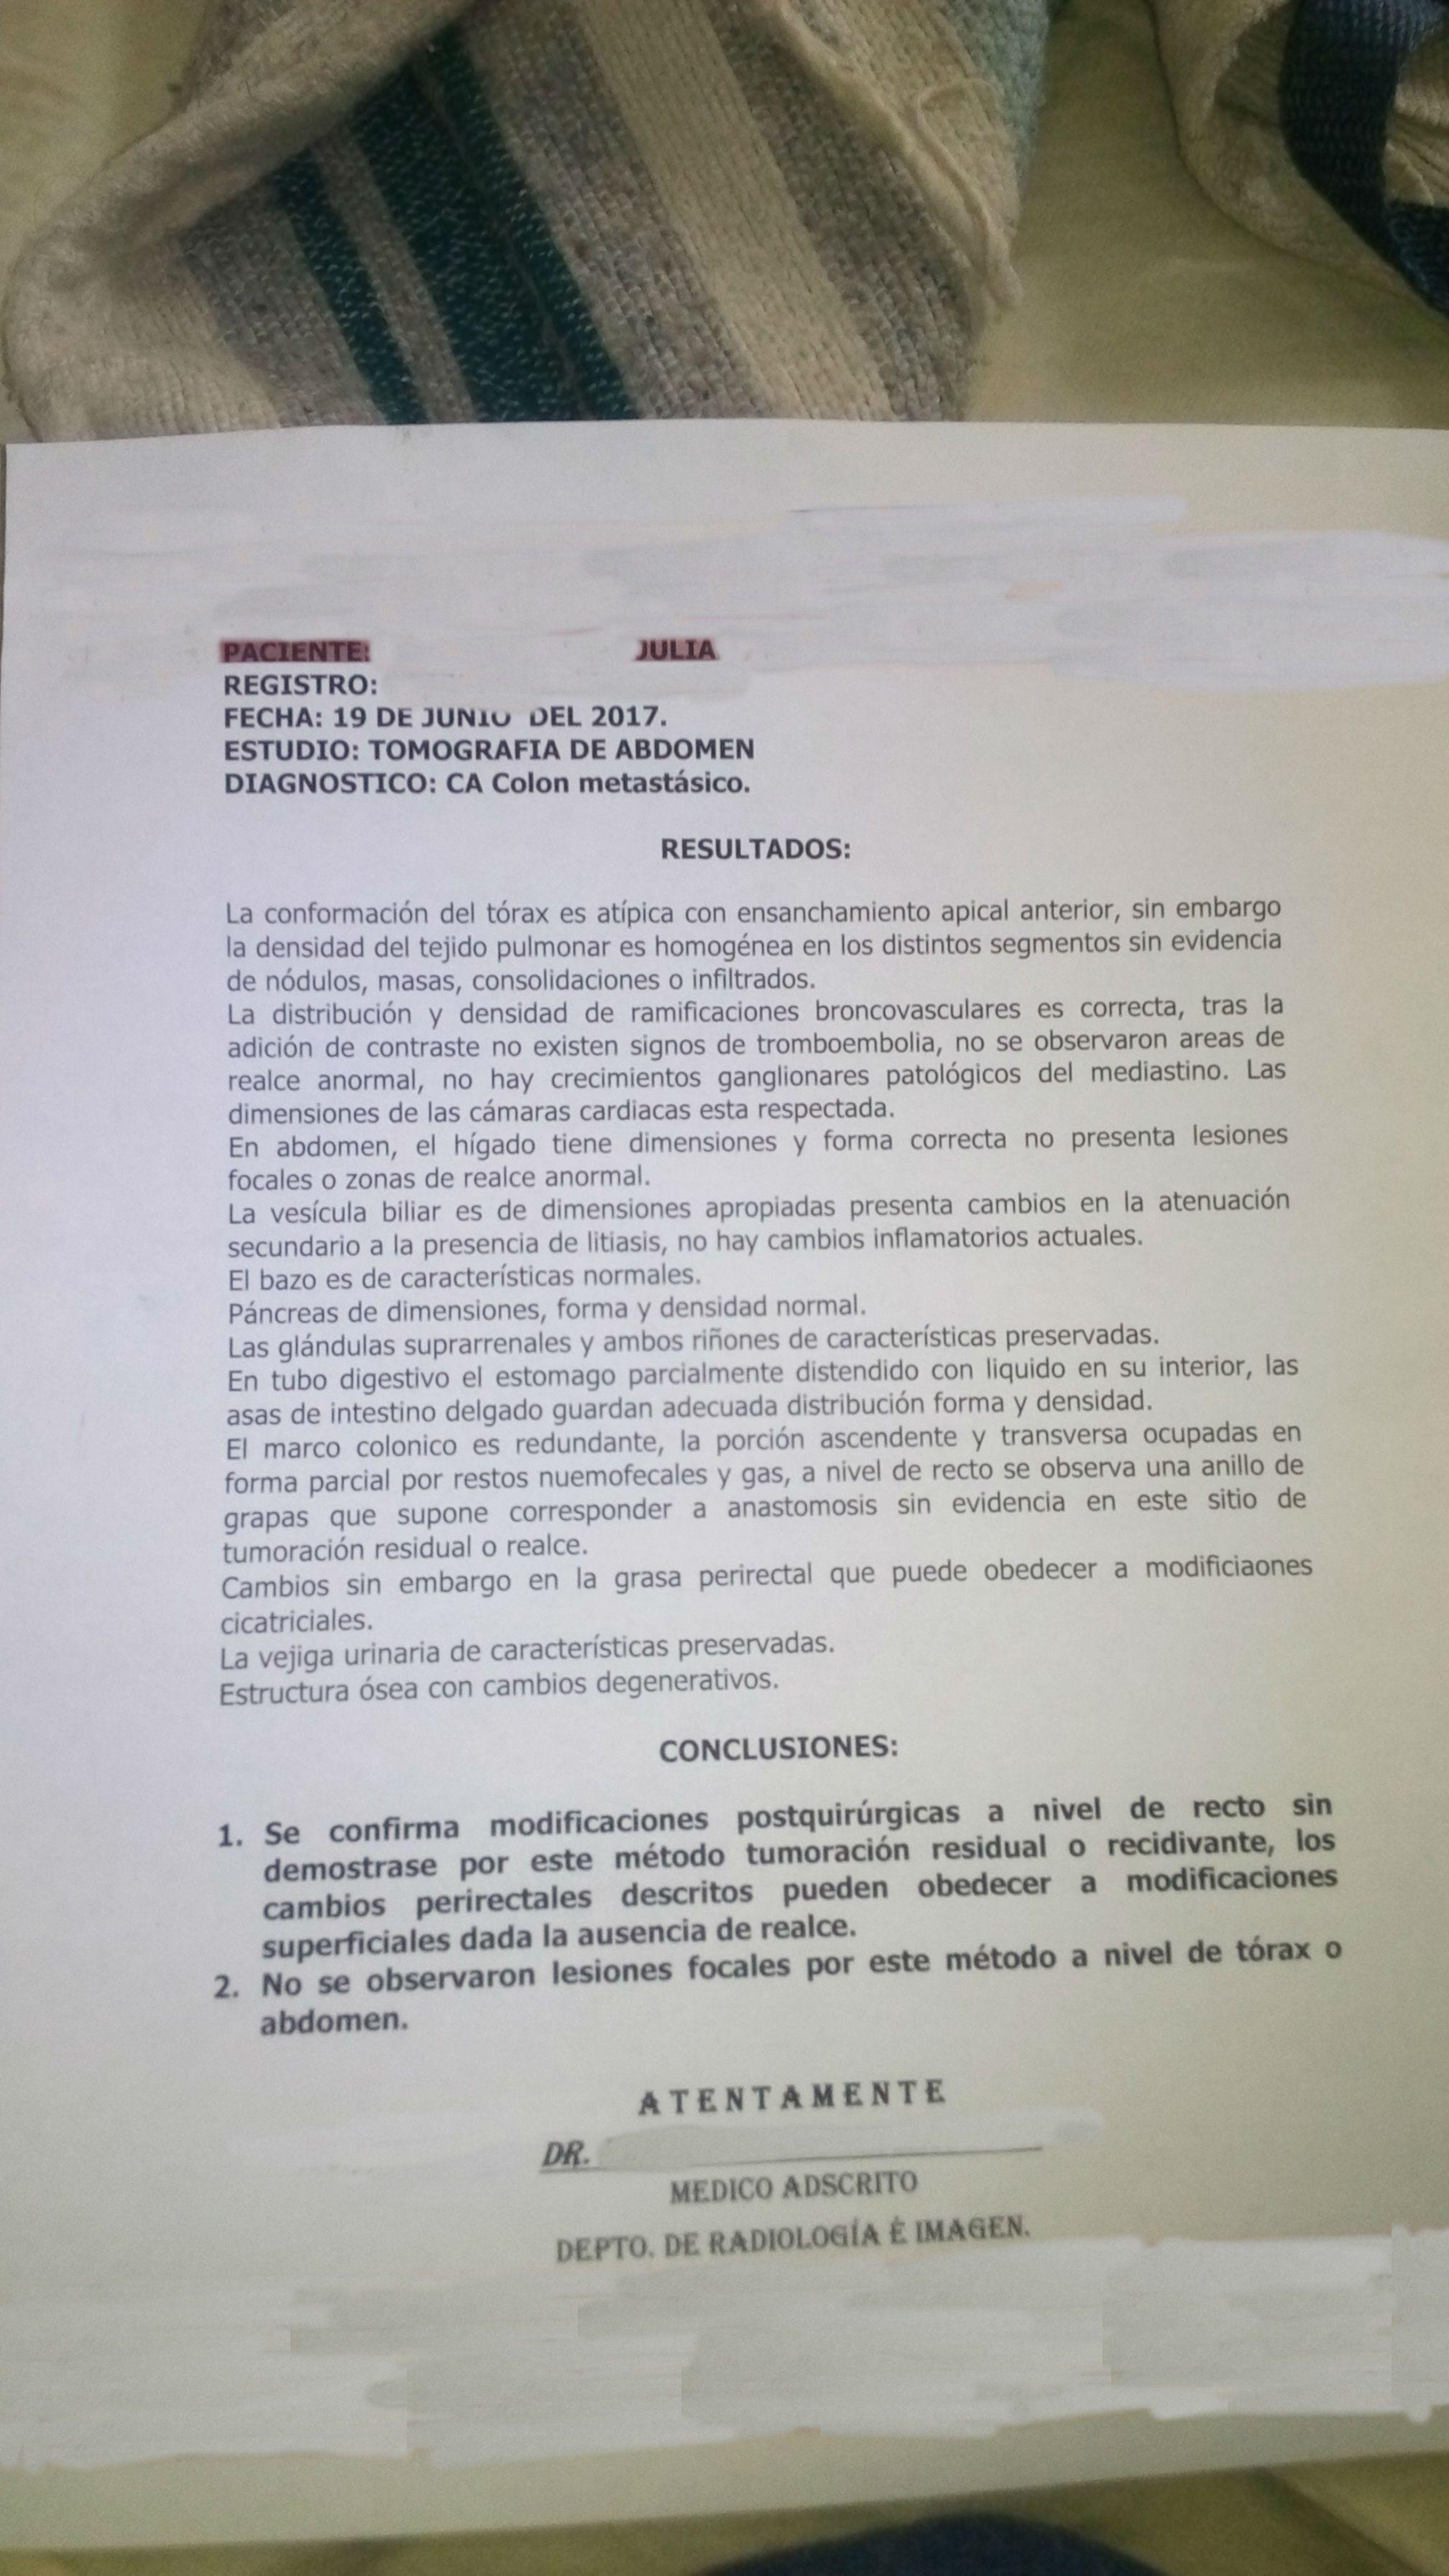 LifEscozul® - Julia 2 - Cáncer de Cólon